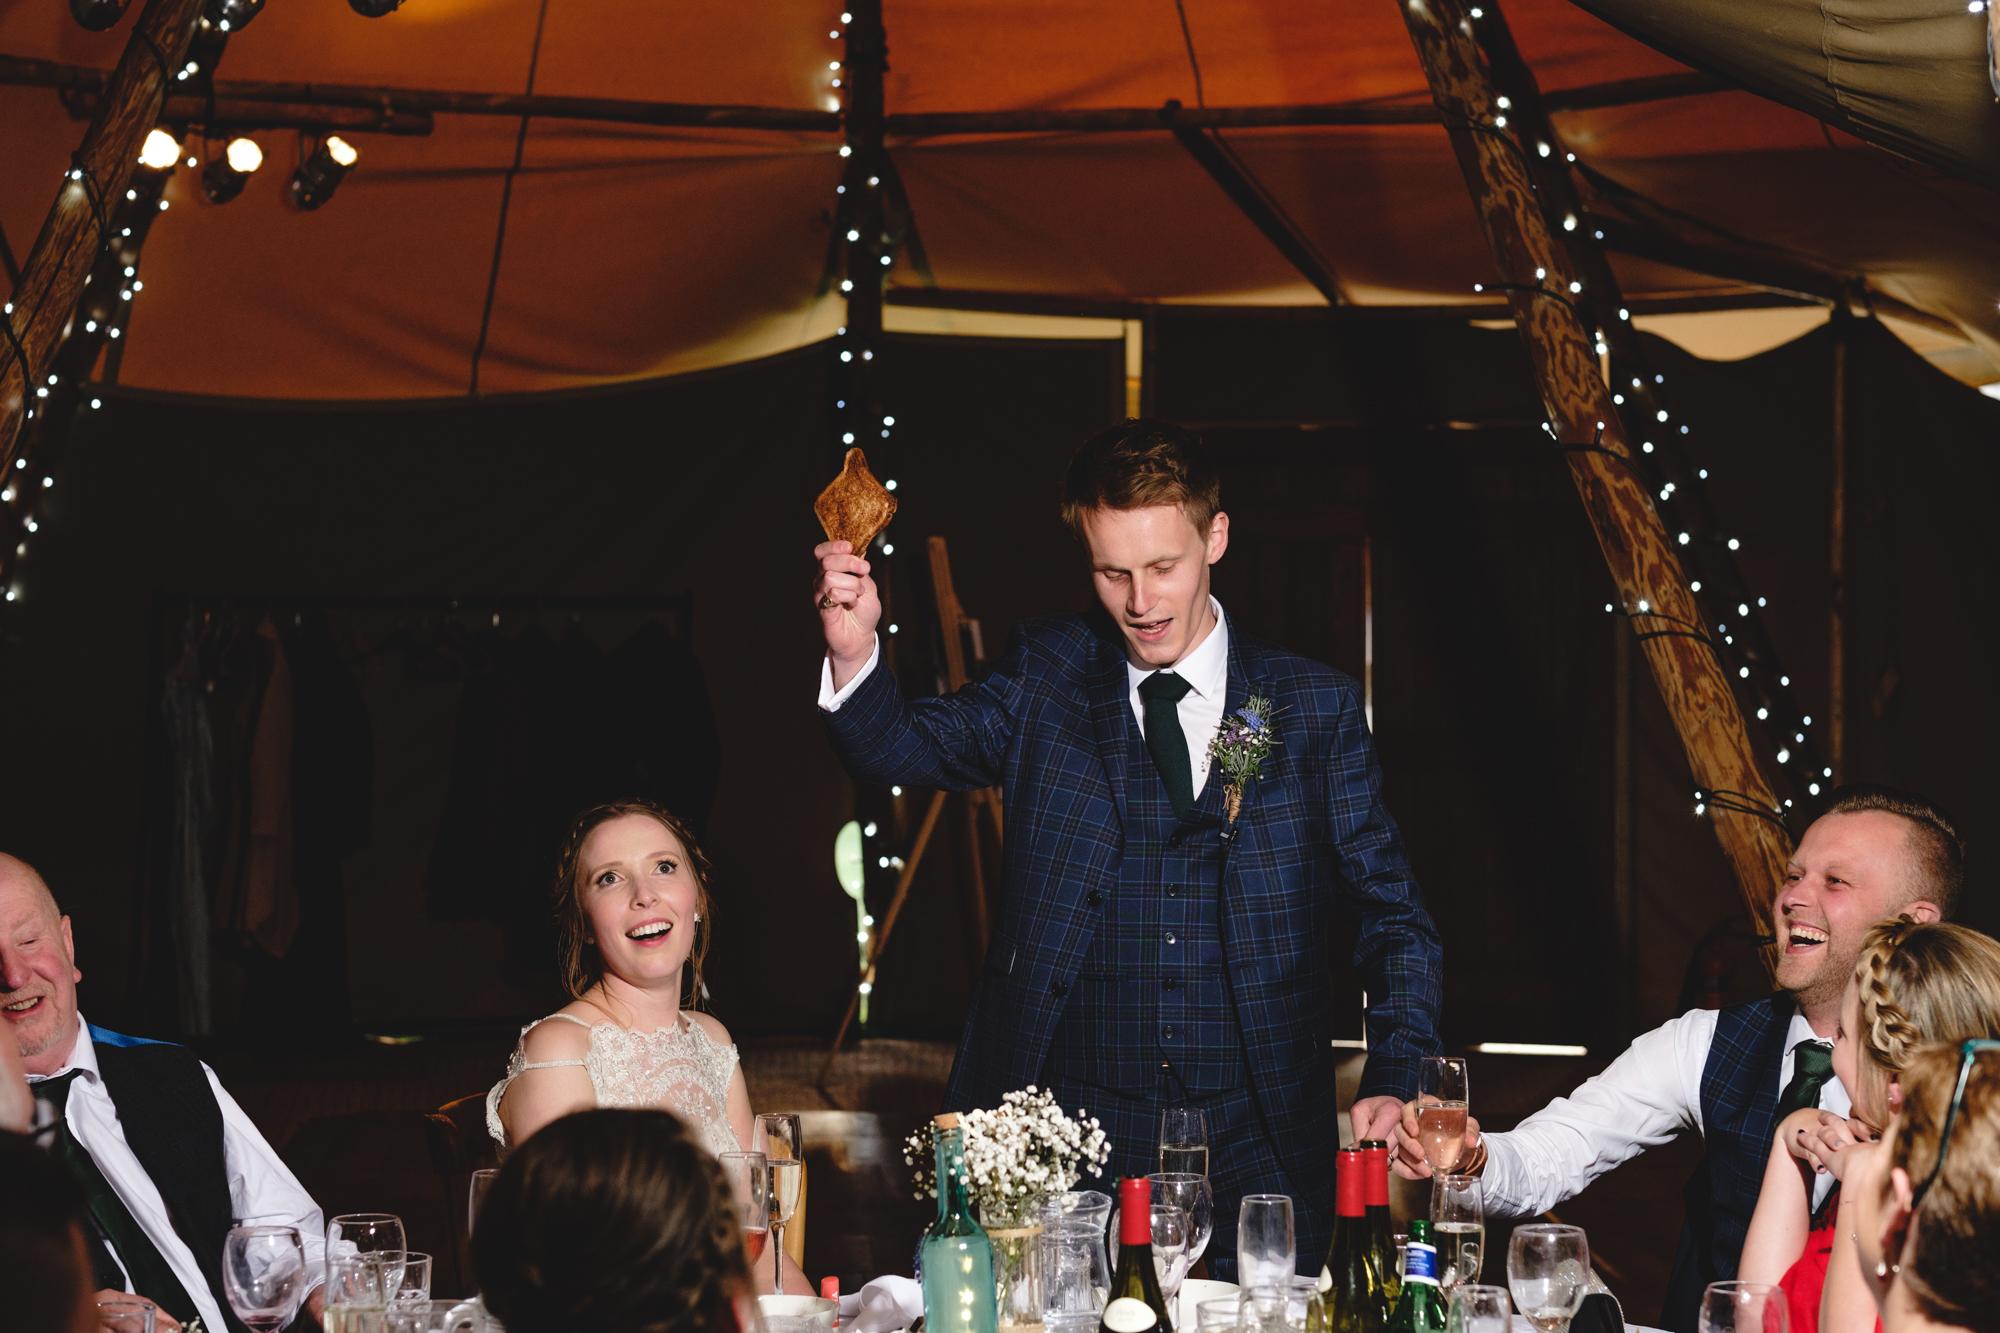 Katie and Dode weddings (171 of 207).jpg